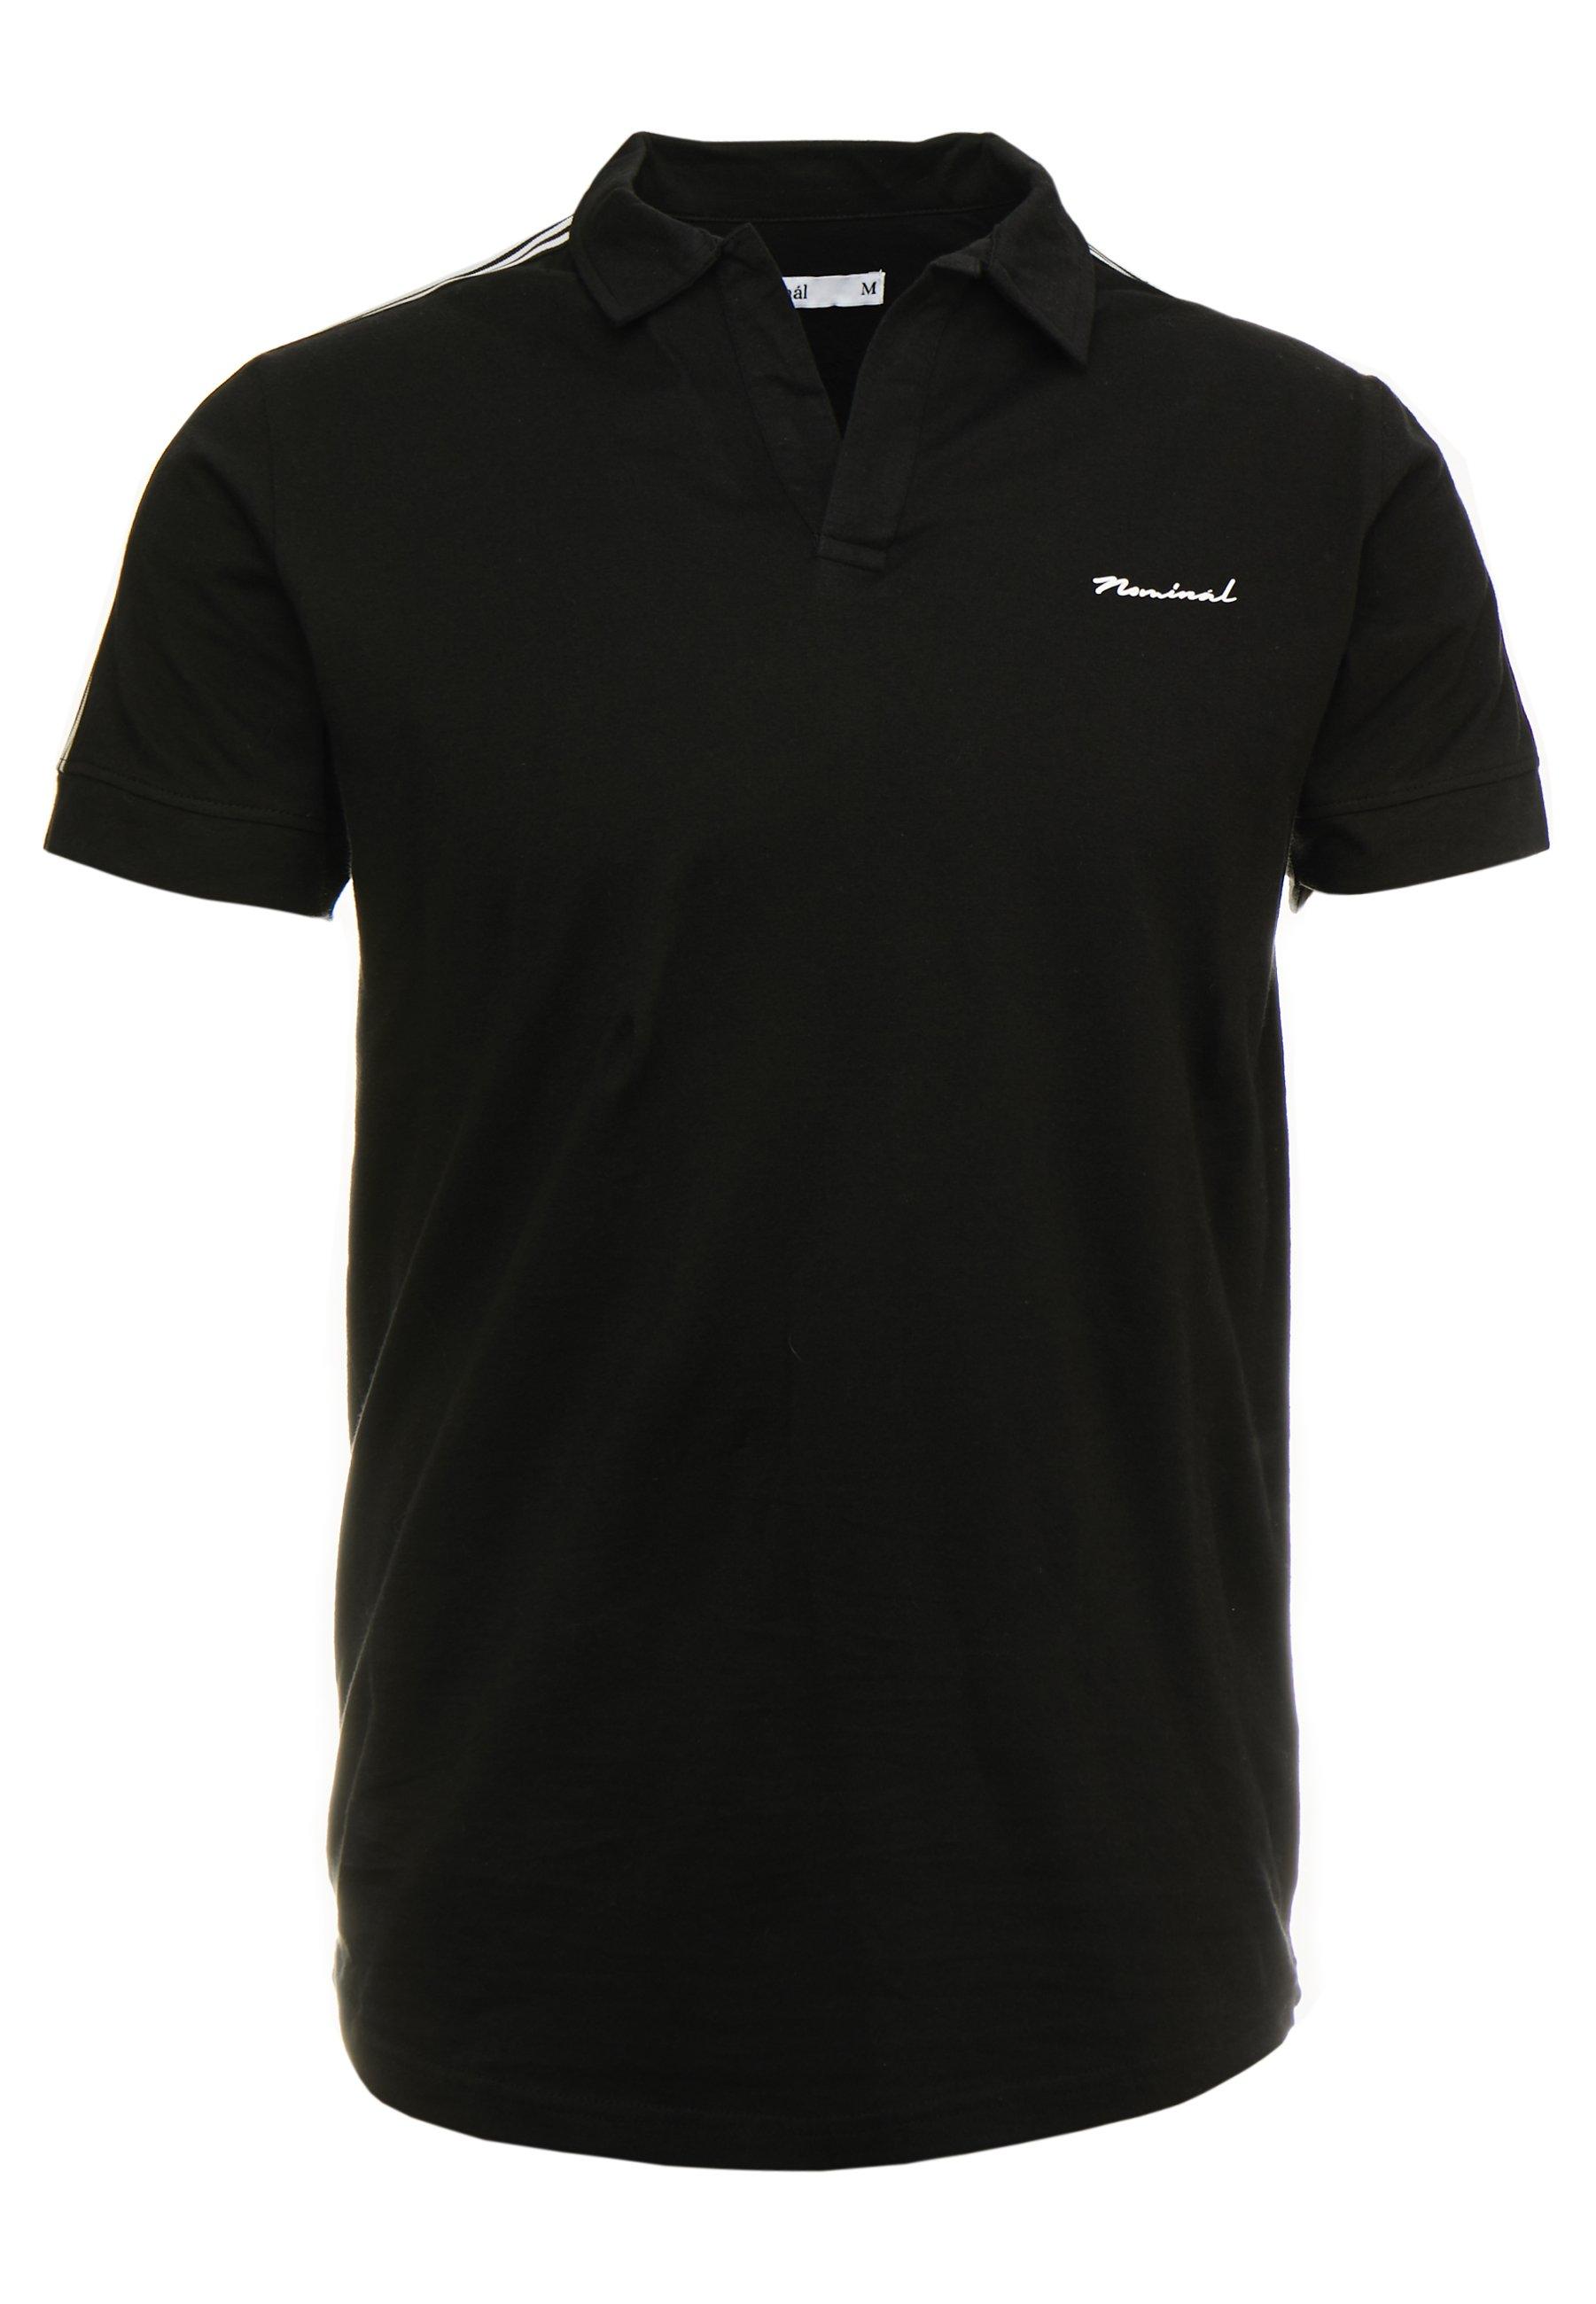 Nominal Foster - Poloshirt Black